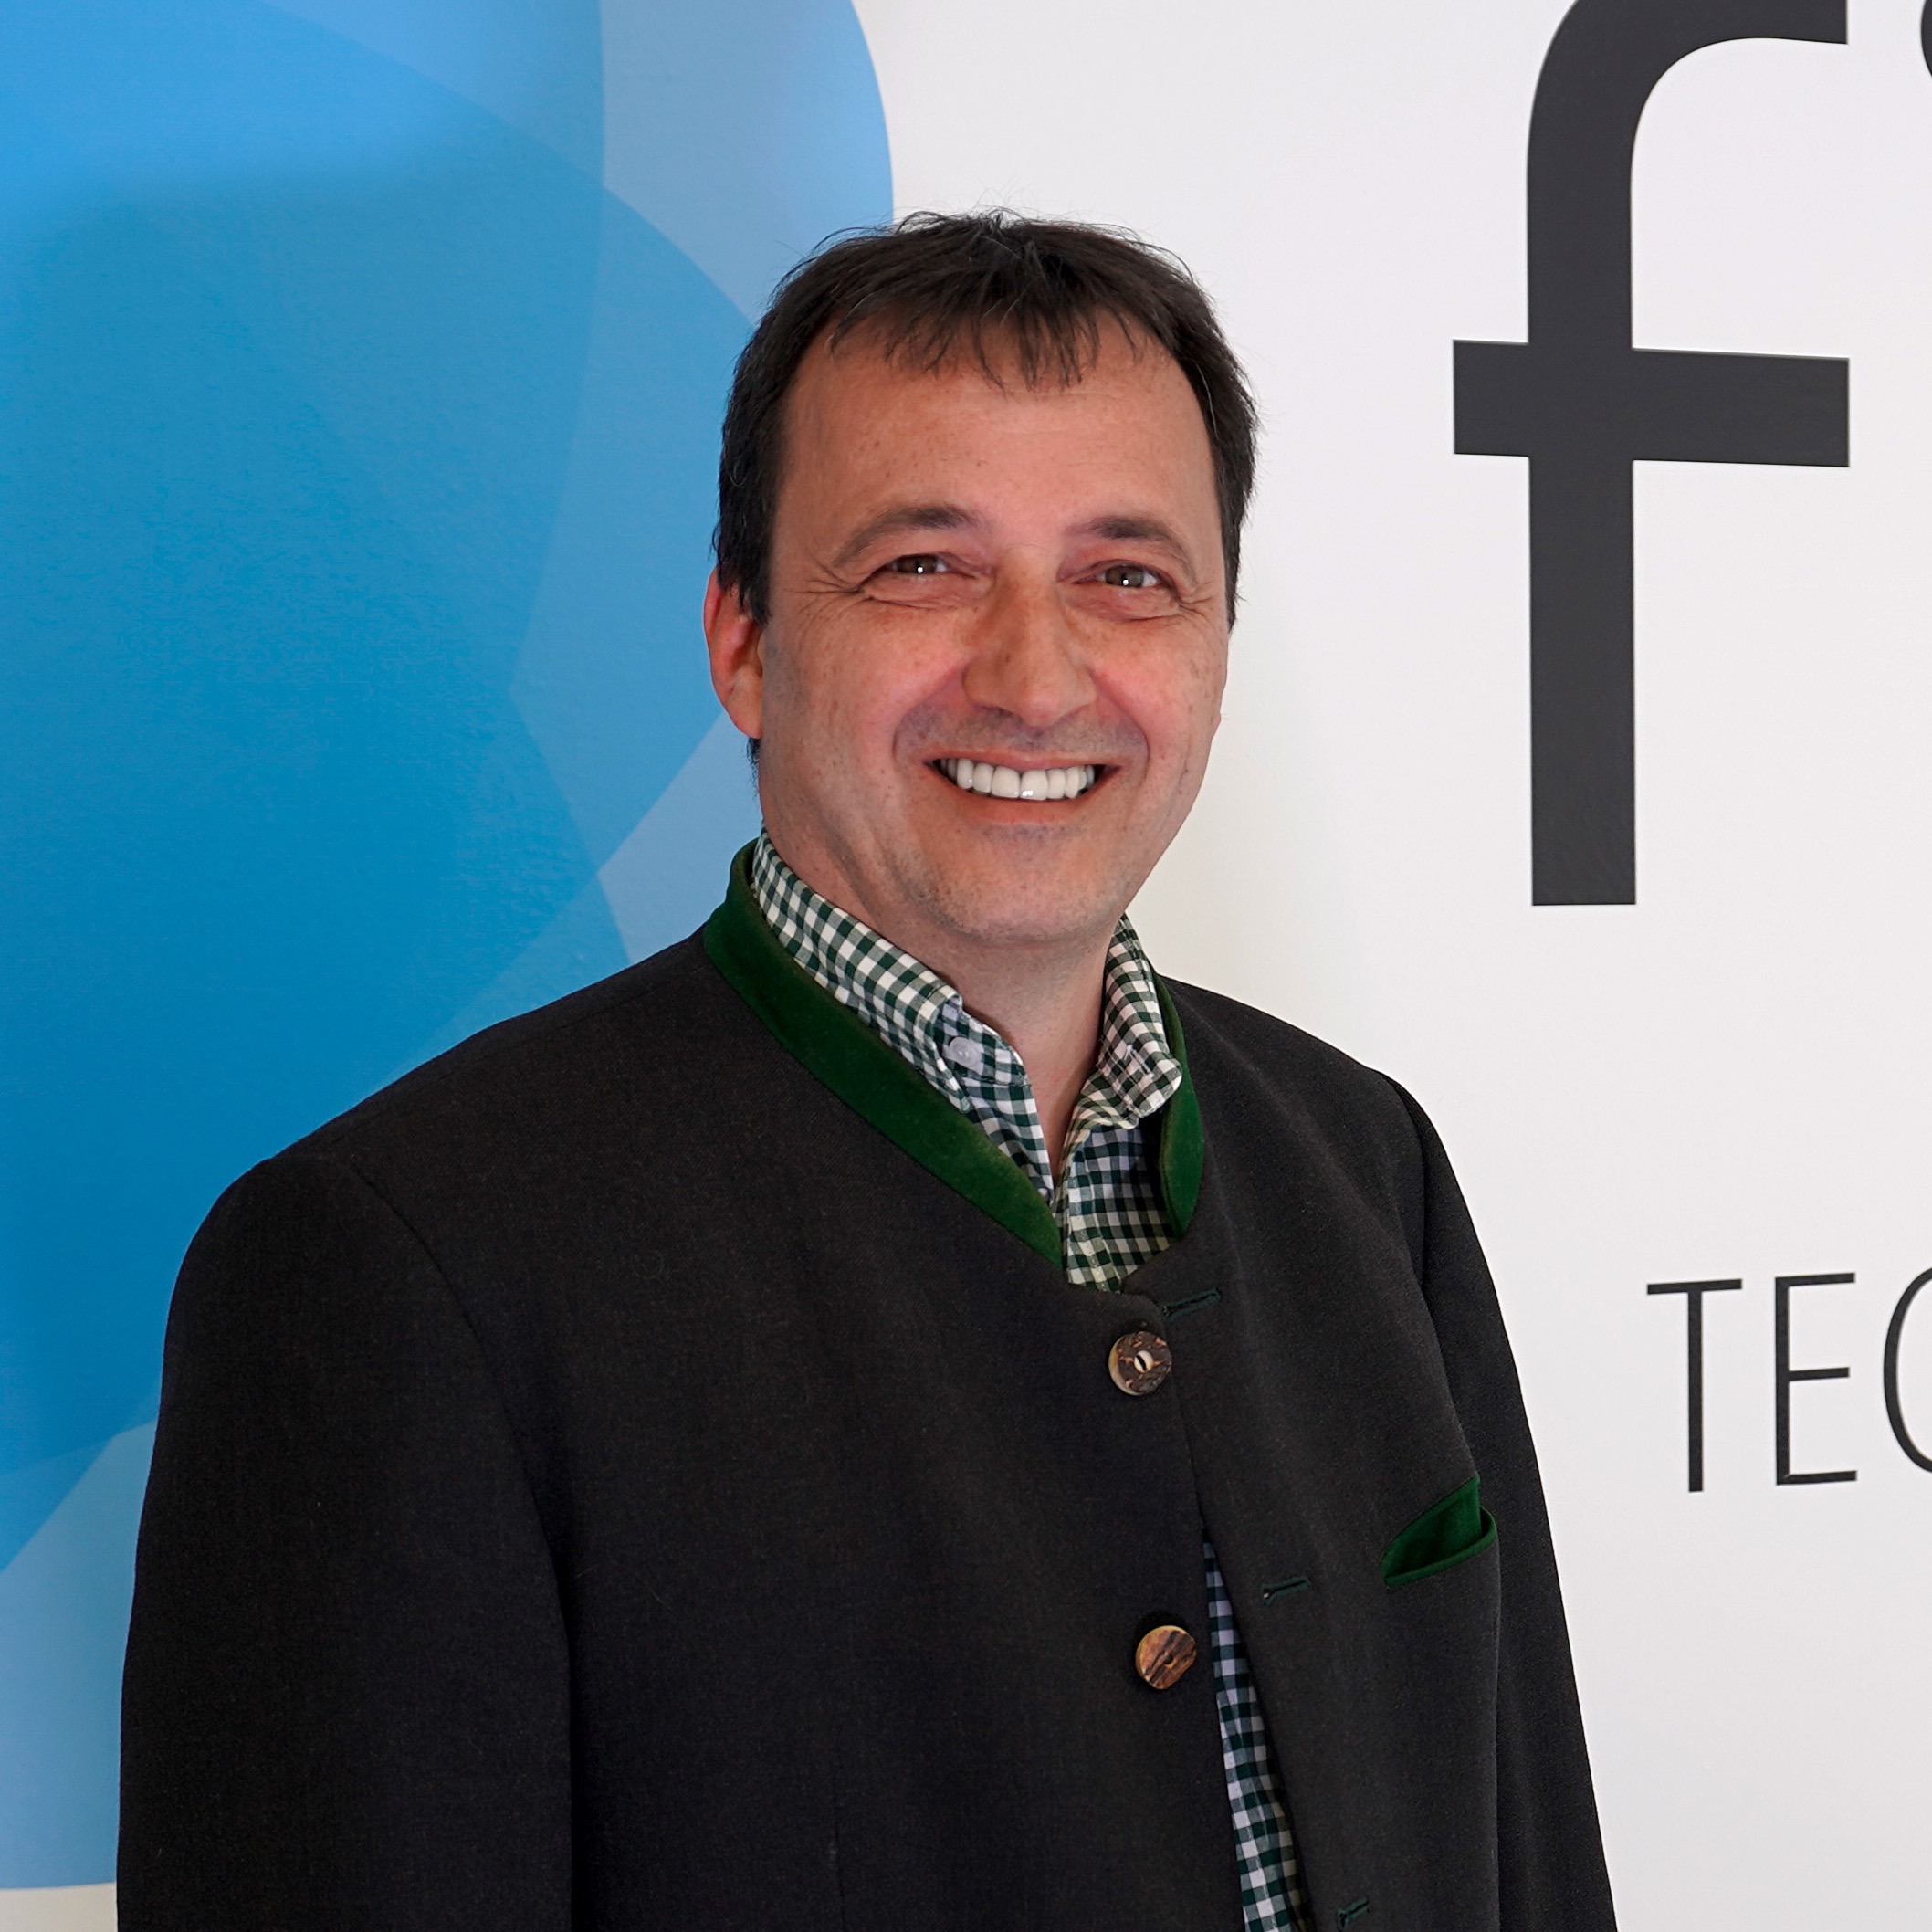 Thomas Feierl